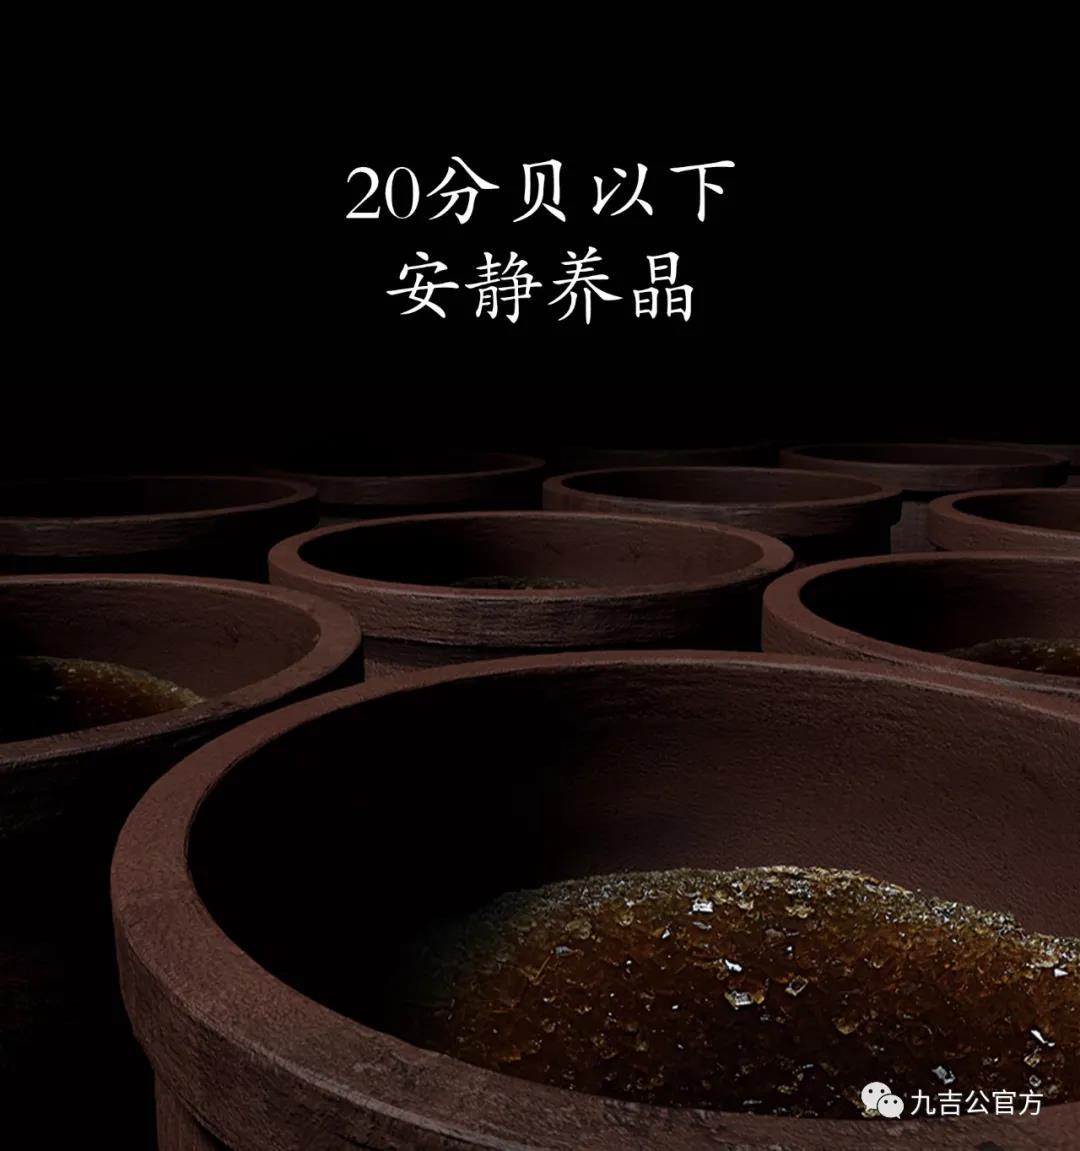 WeChat Image 20210711095202